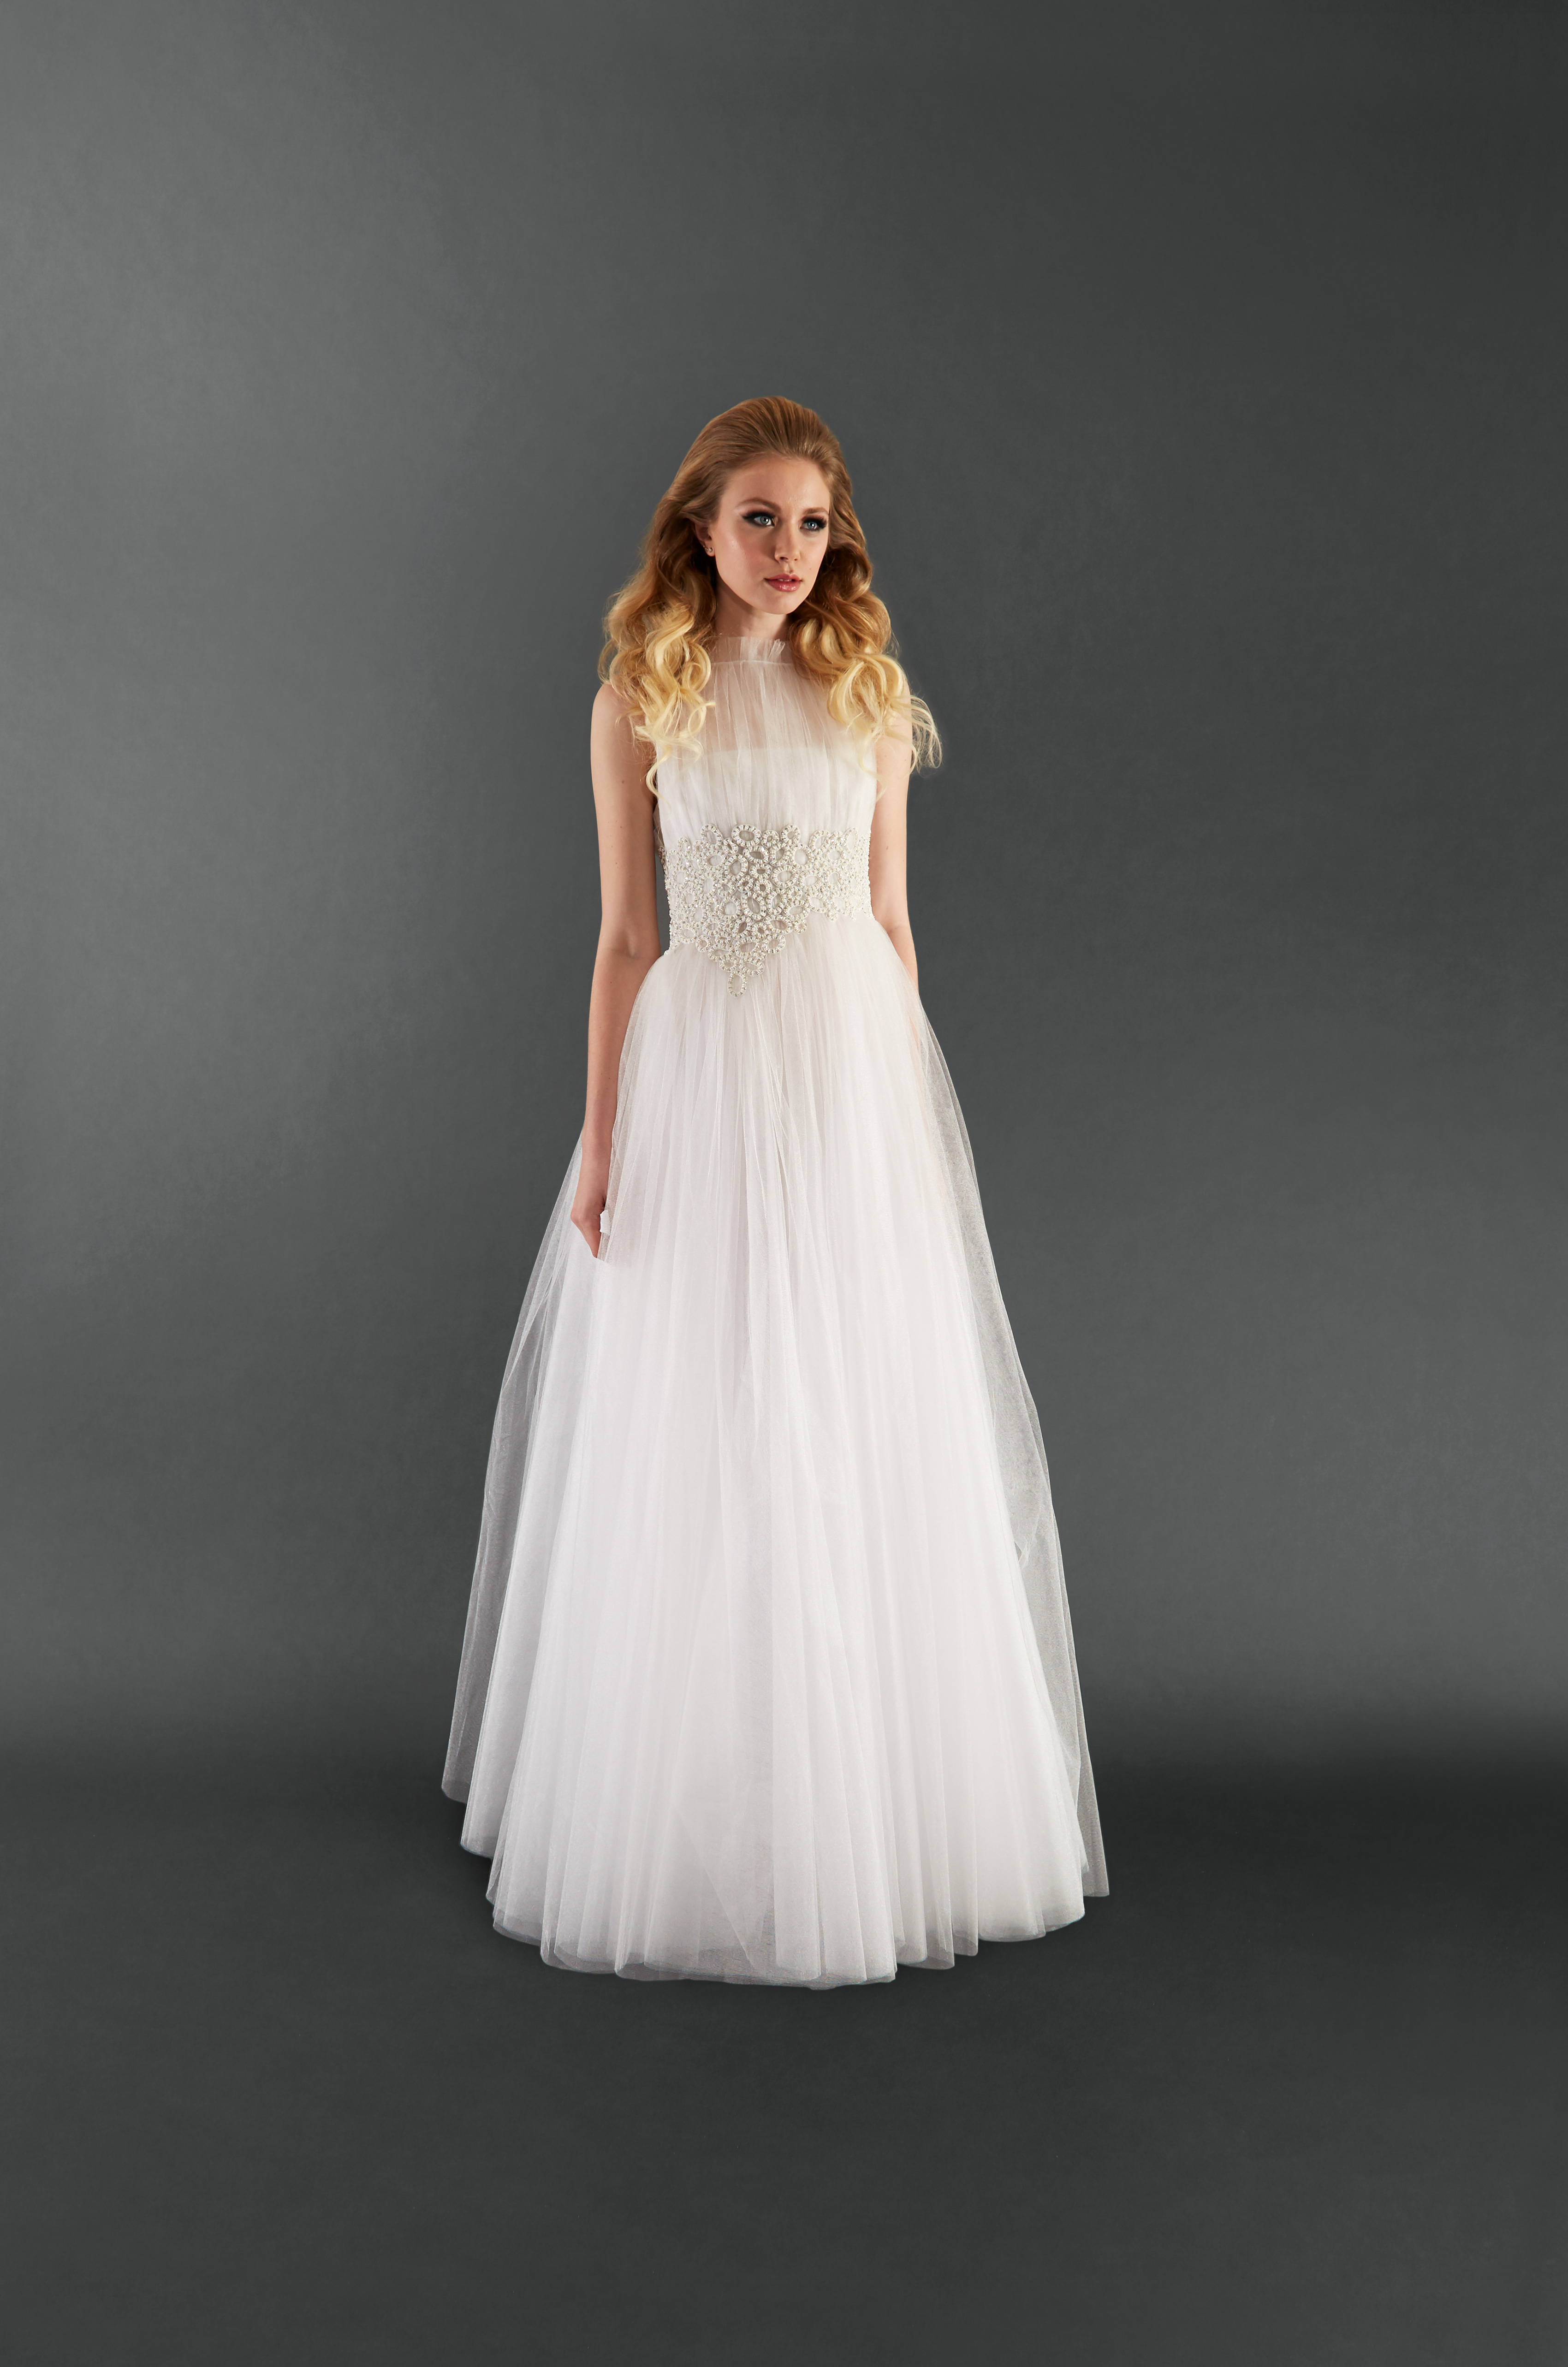 randi rahm tulle wedding dress spring 2018